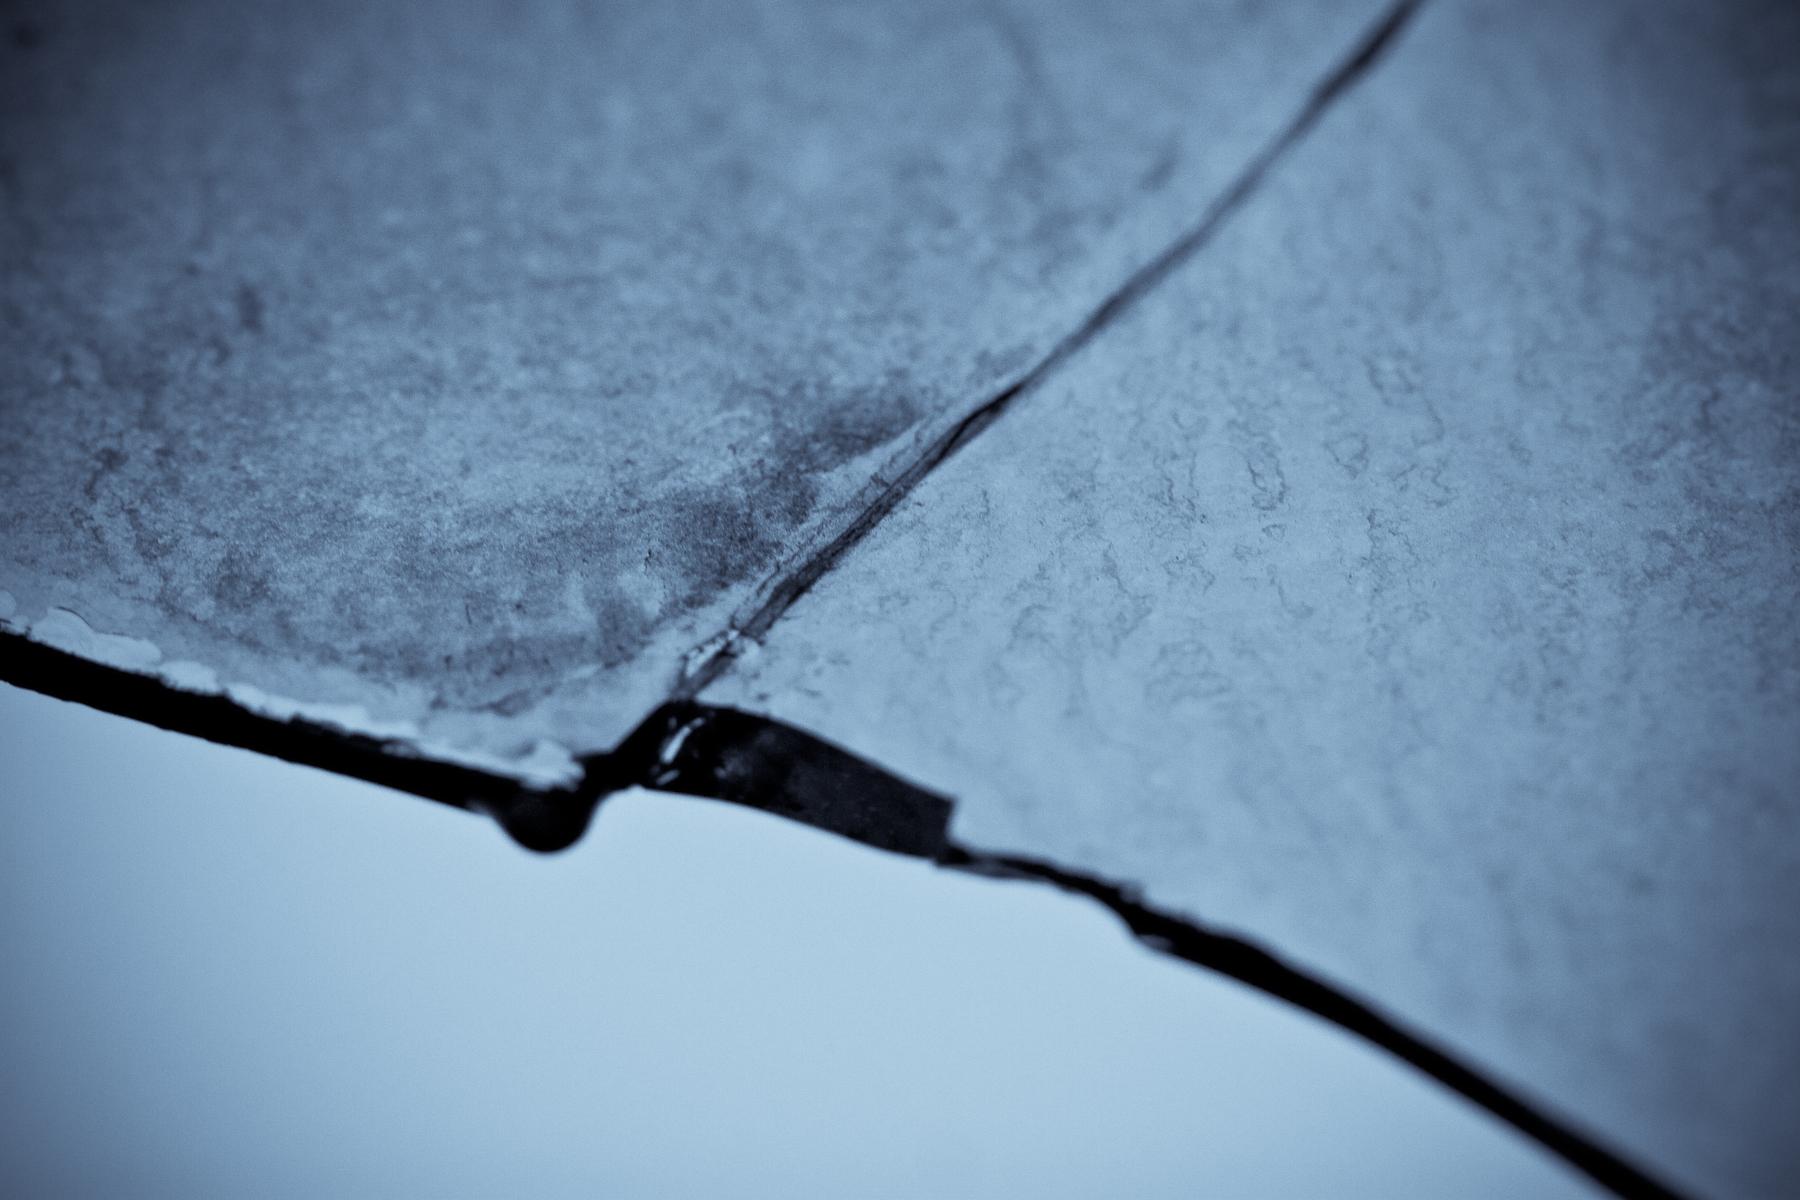 Broken glass photo